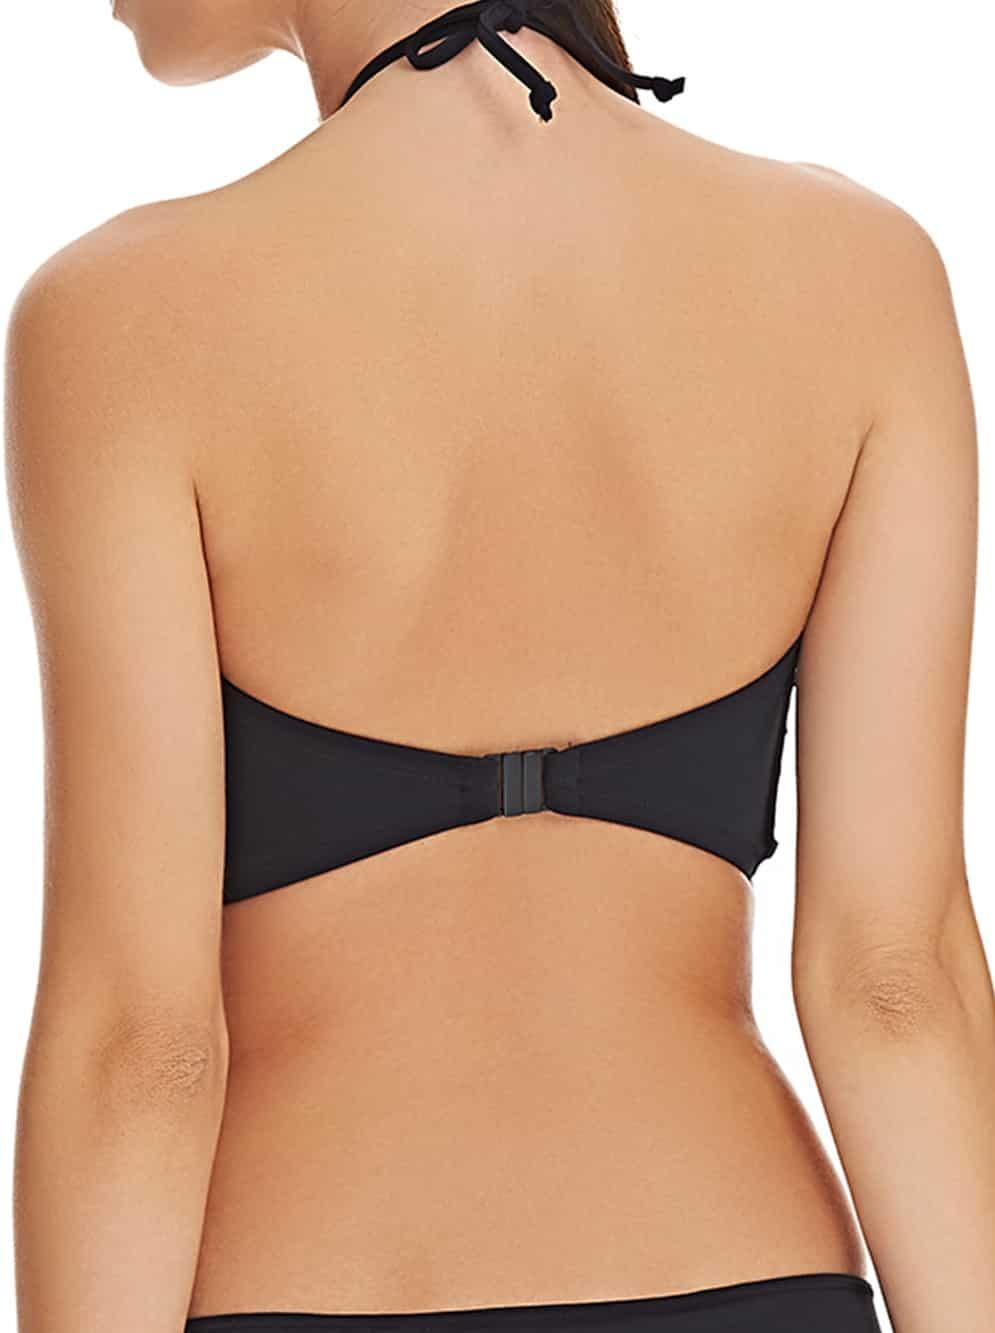 4256369451d5a Freya, AS3944 Remix, Underwire Padded Bandeau Bikini Top, black